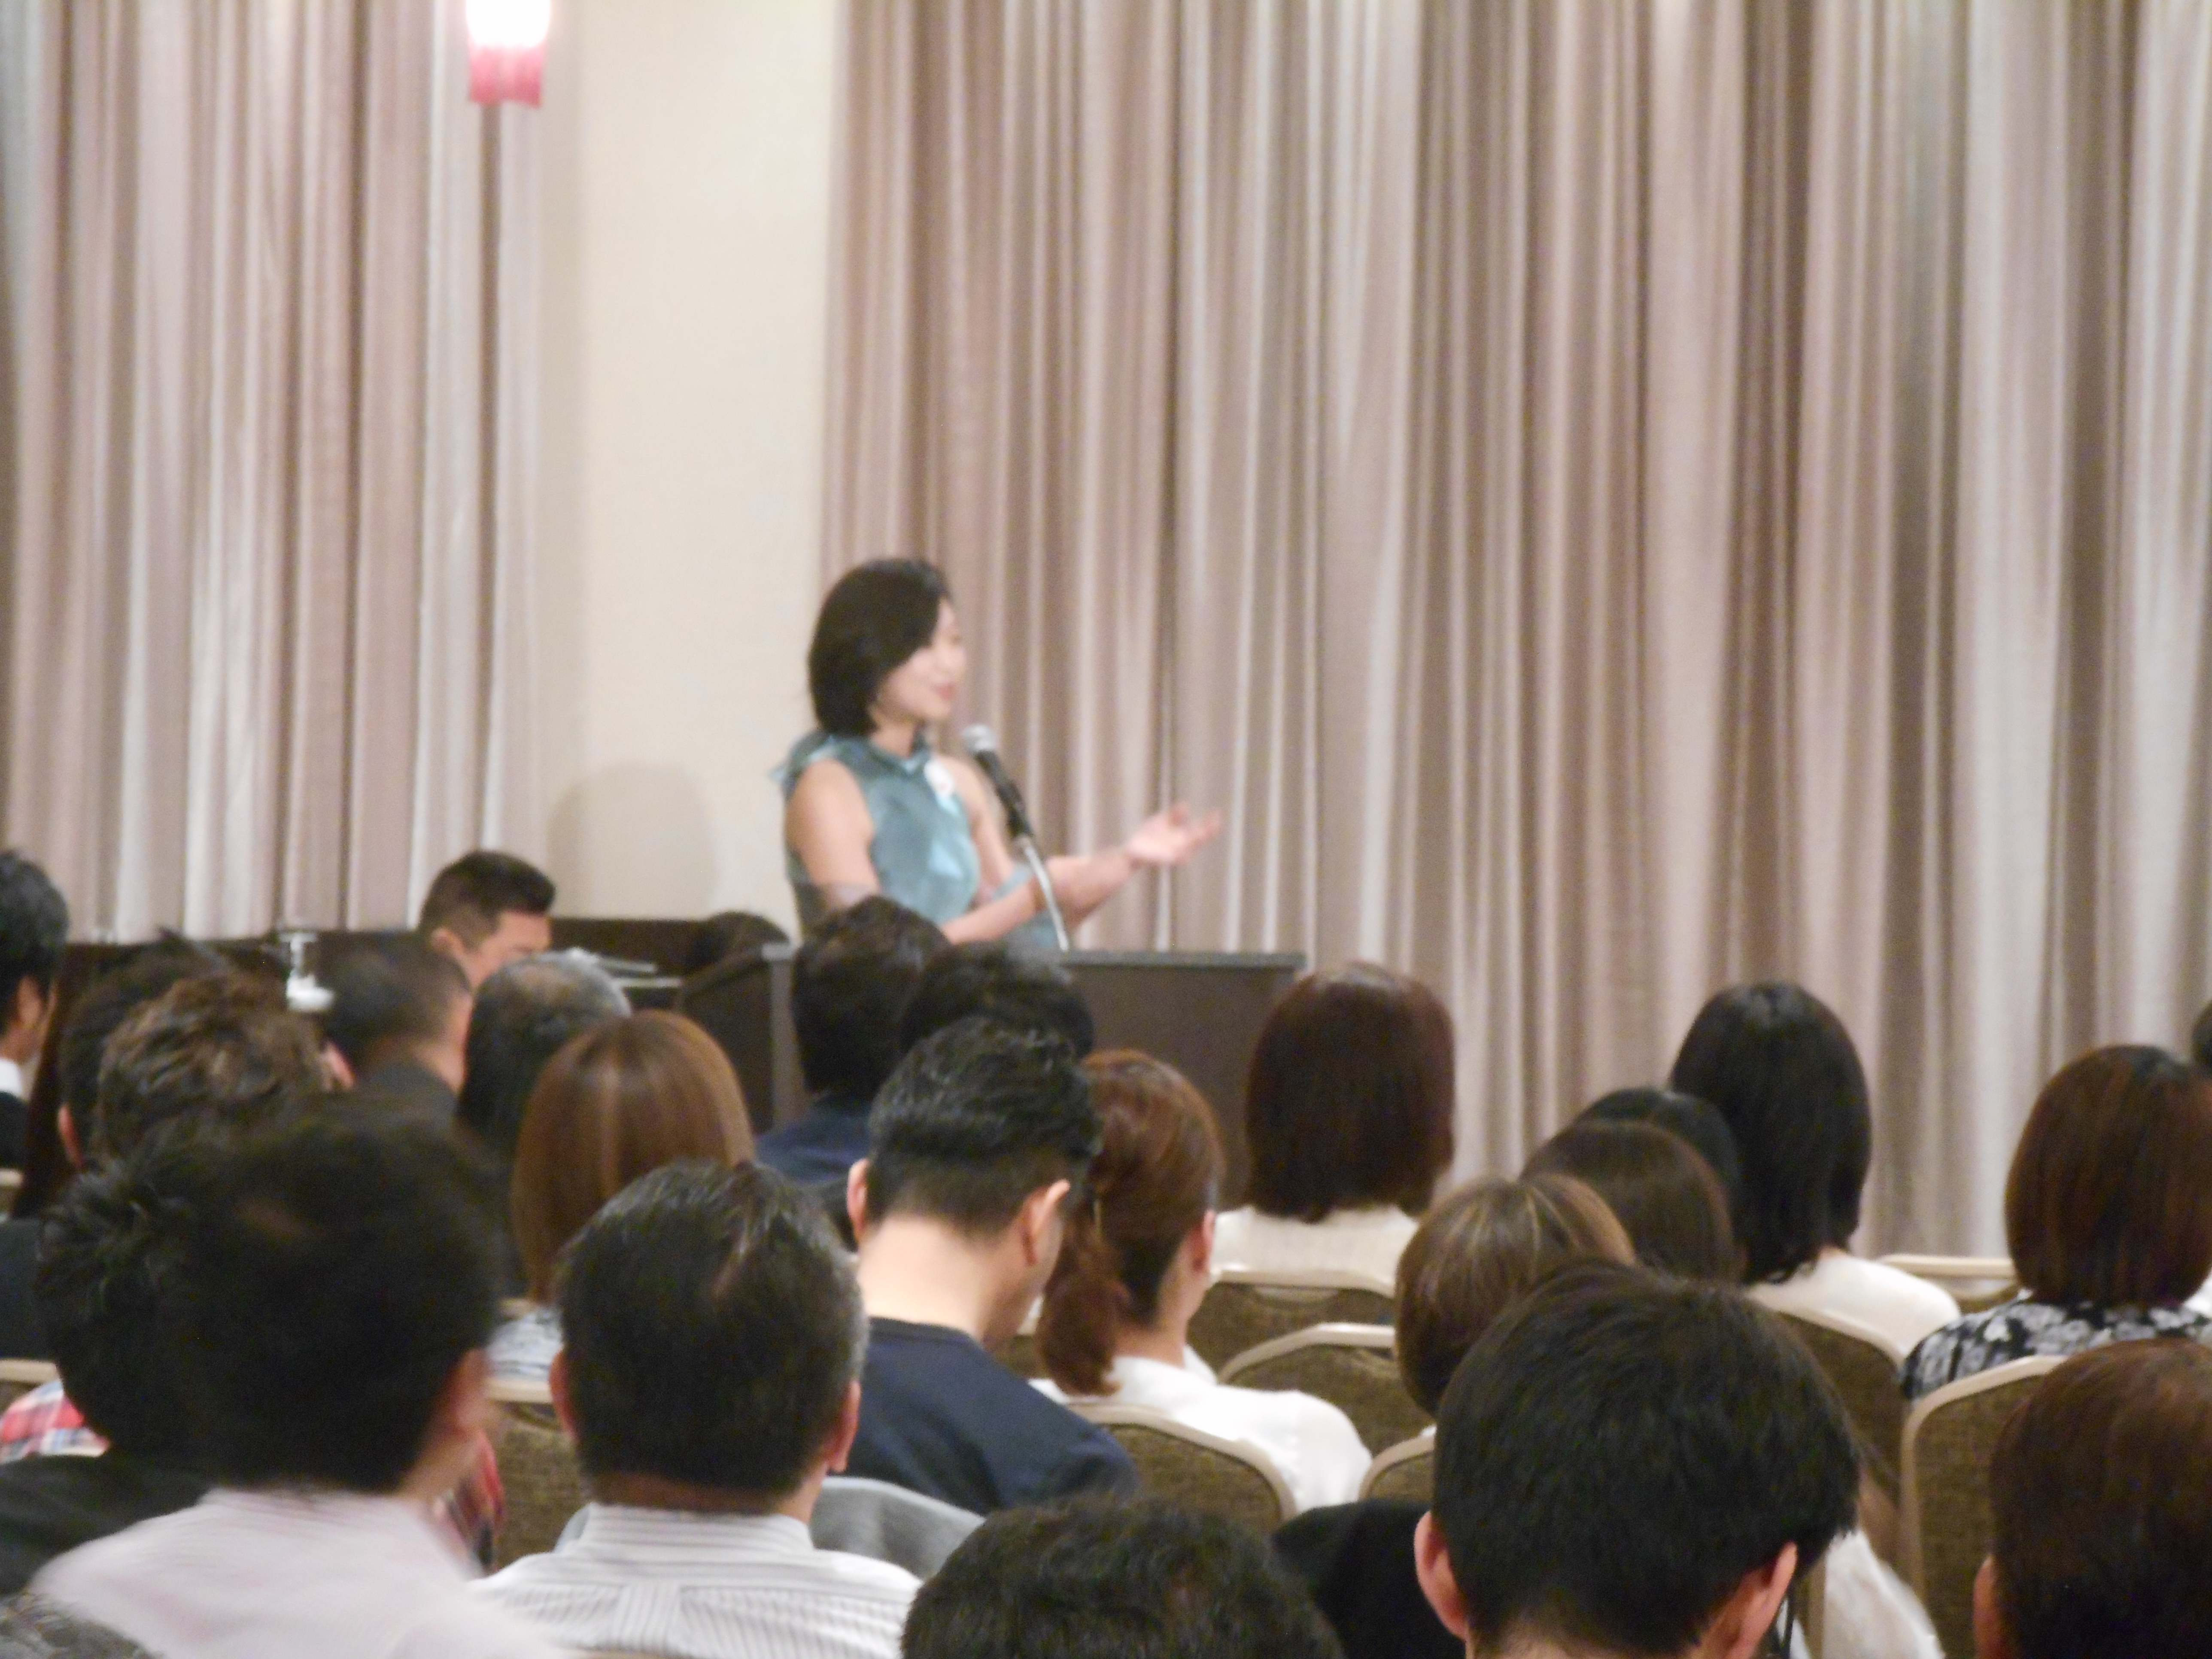 DSCN2100 - 平成30年度 東京思風塾 4月7日(土)「時代が問題をつくり、問題が人物をつくる」